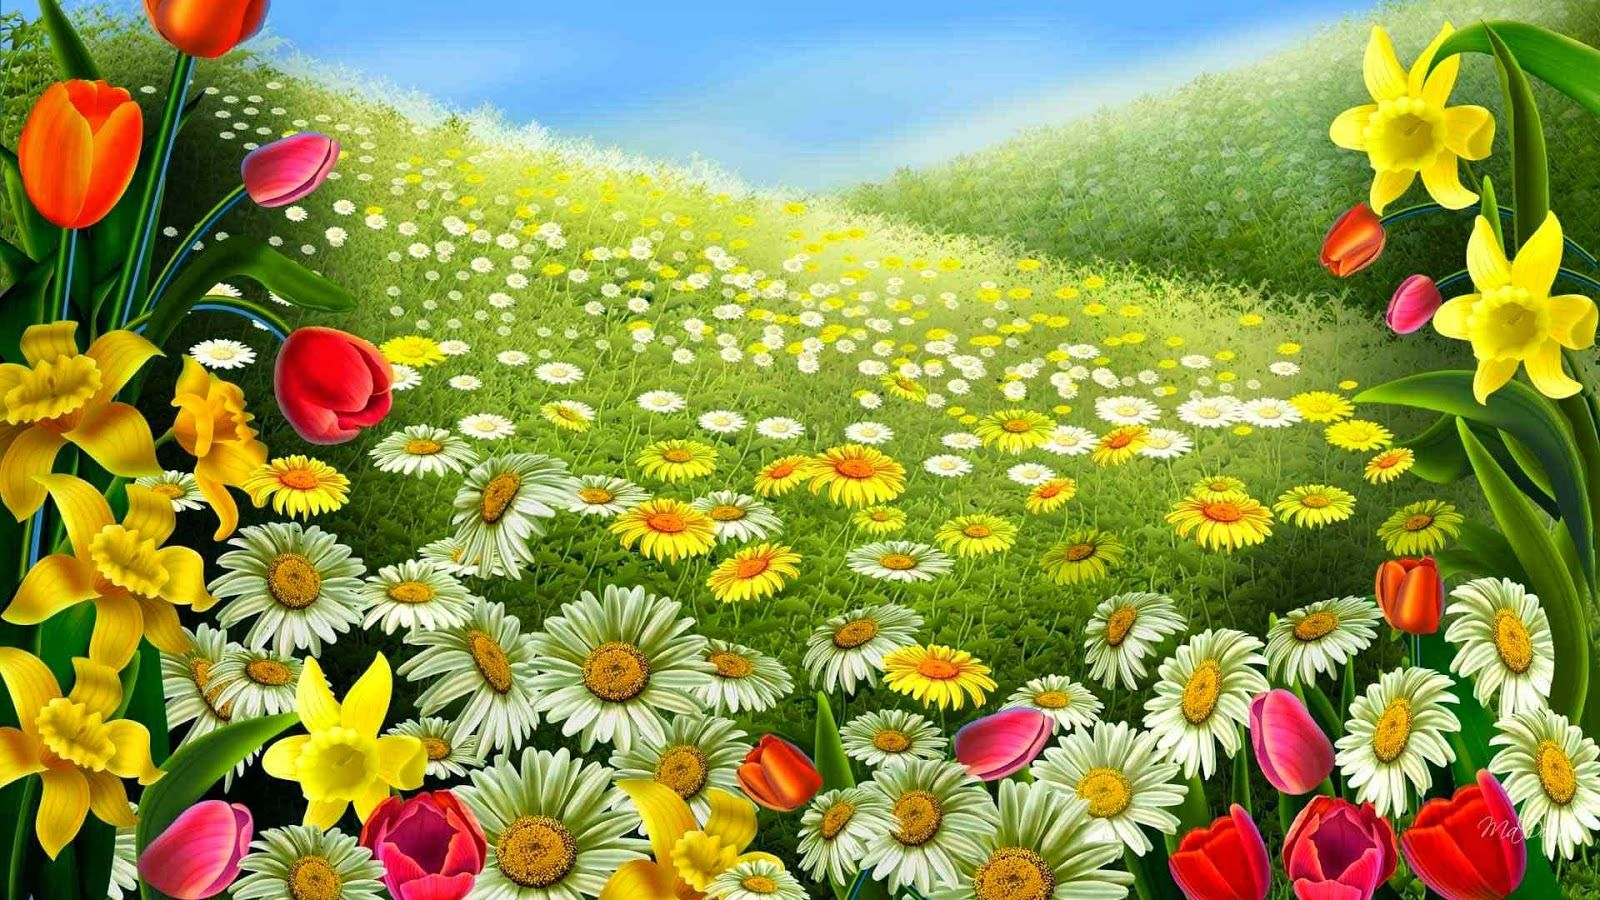 Milline Taim Sobib Sinu Horoskoobiga Spring Wallpaper Hd Spring Wallpaper Beautiful Flowers Images